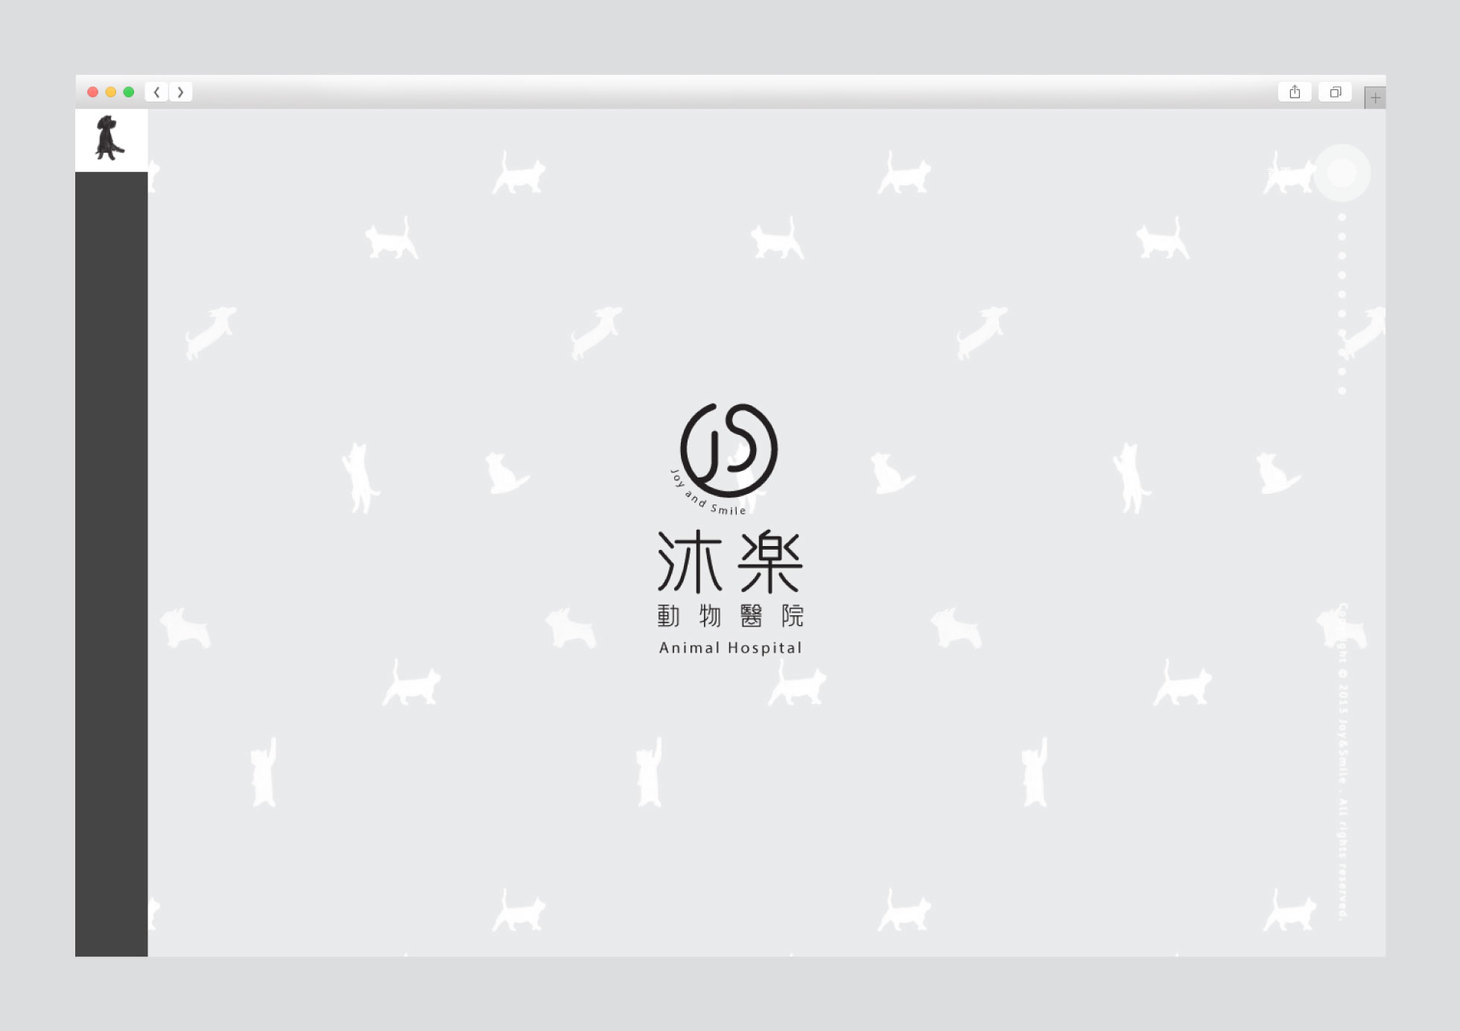 JSV_01.jpg